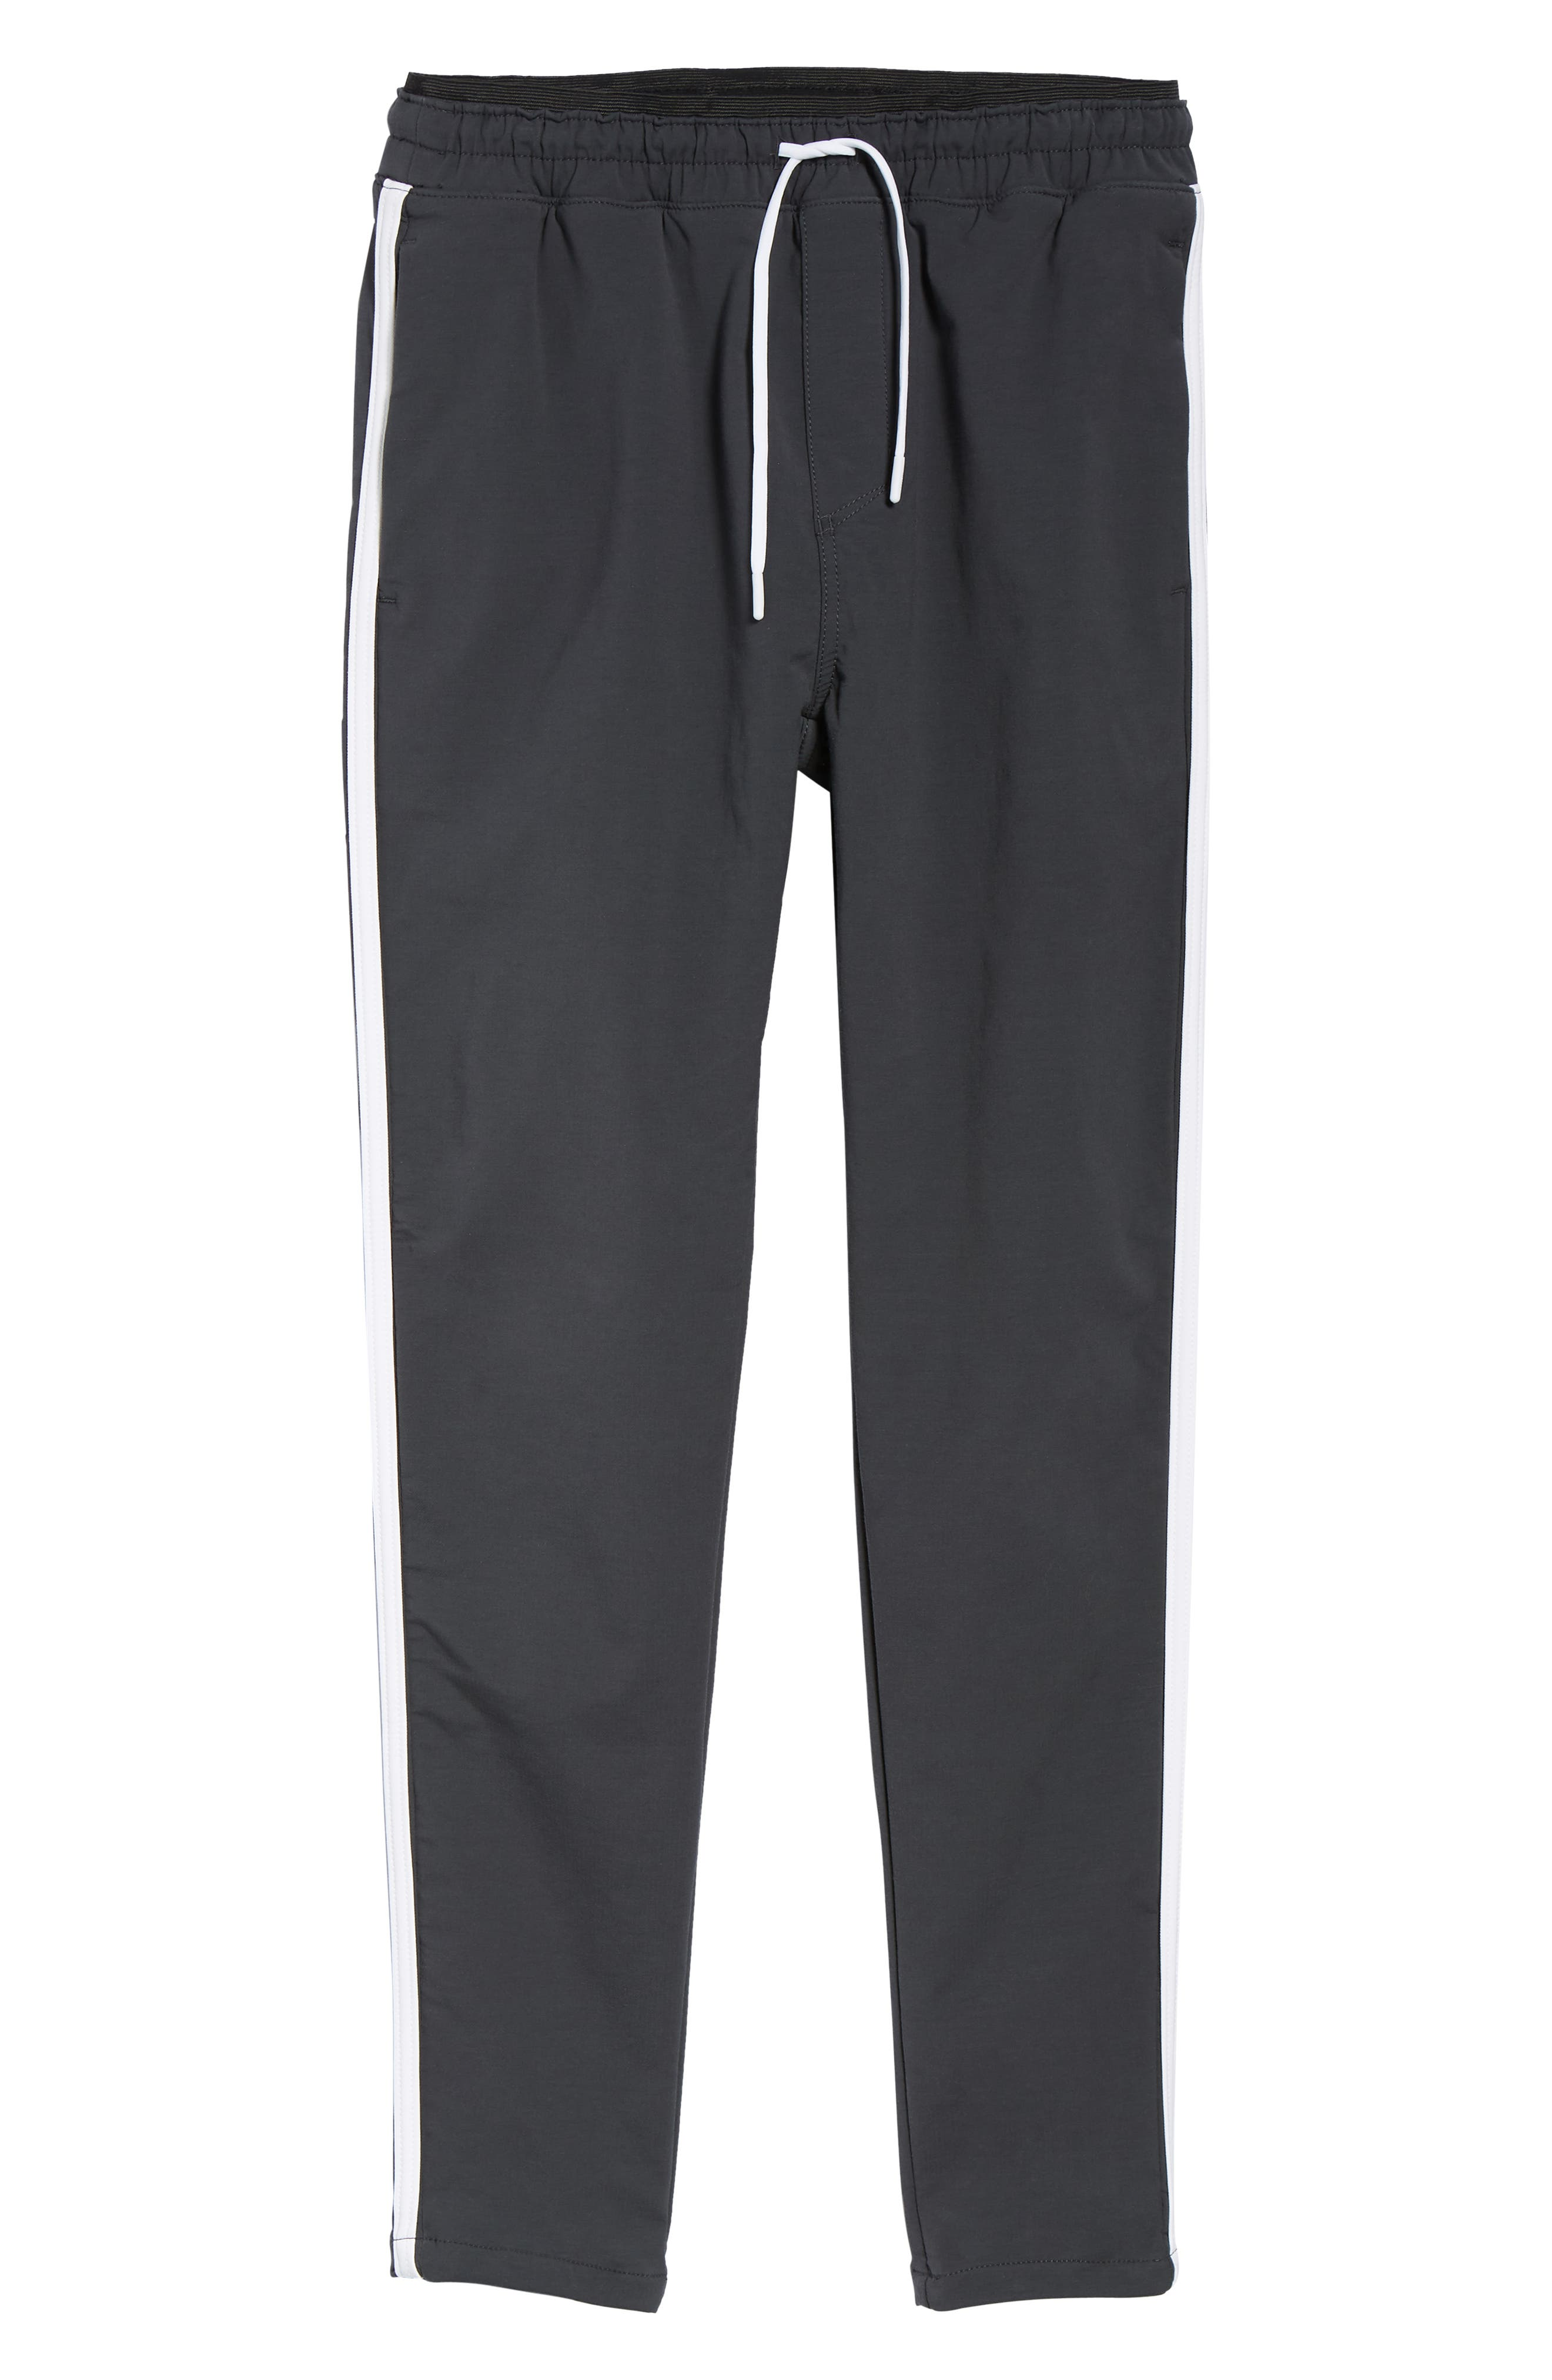 ZANEROBE,                             Jumpshot Slim Track Pants,                             Alternate thumbnail 6, color,                             001